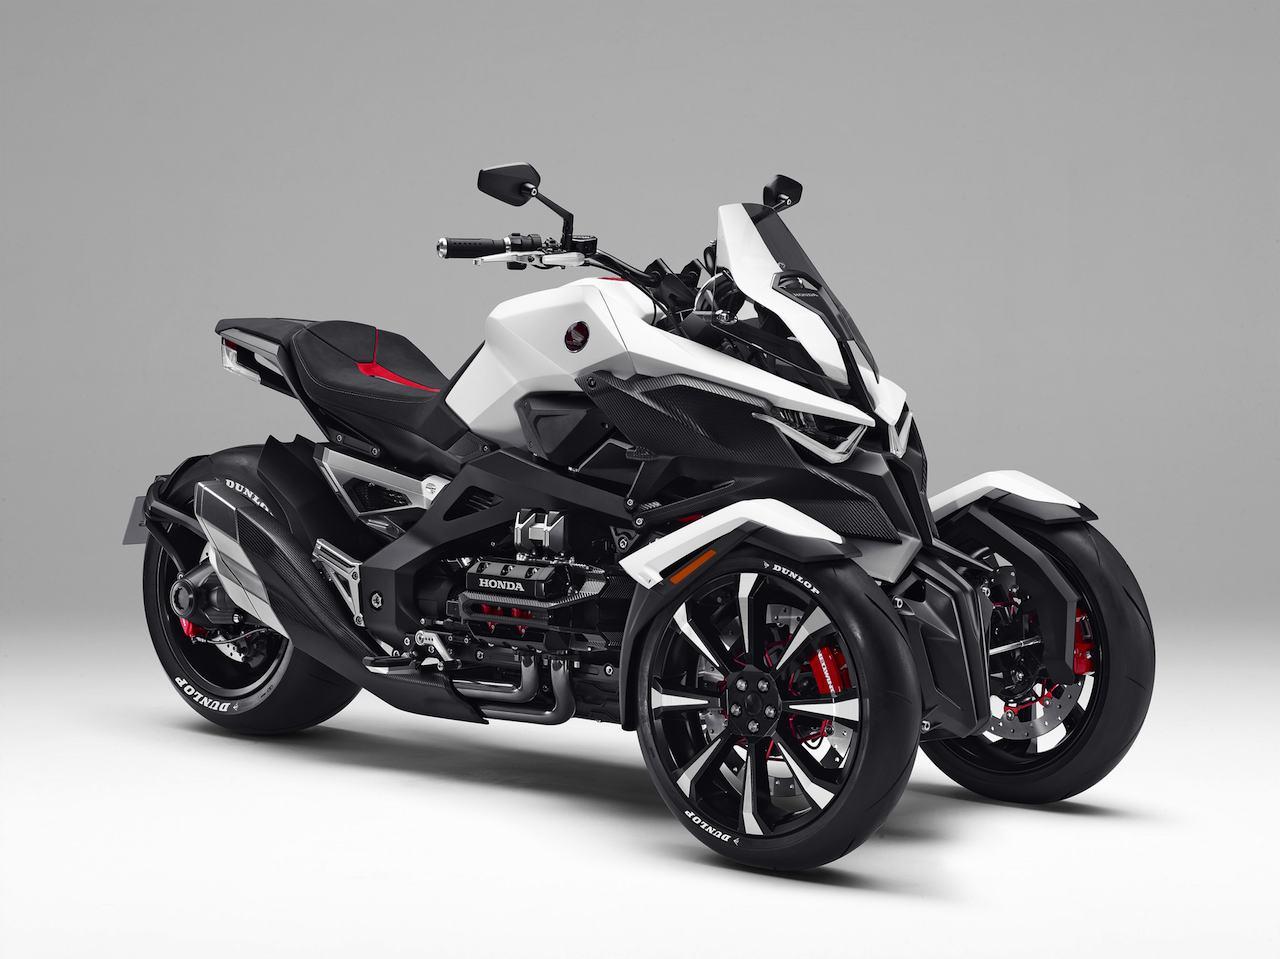 Honda Neowing Concept 2015 01